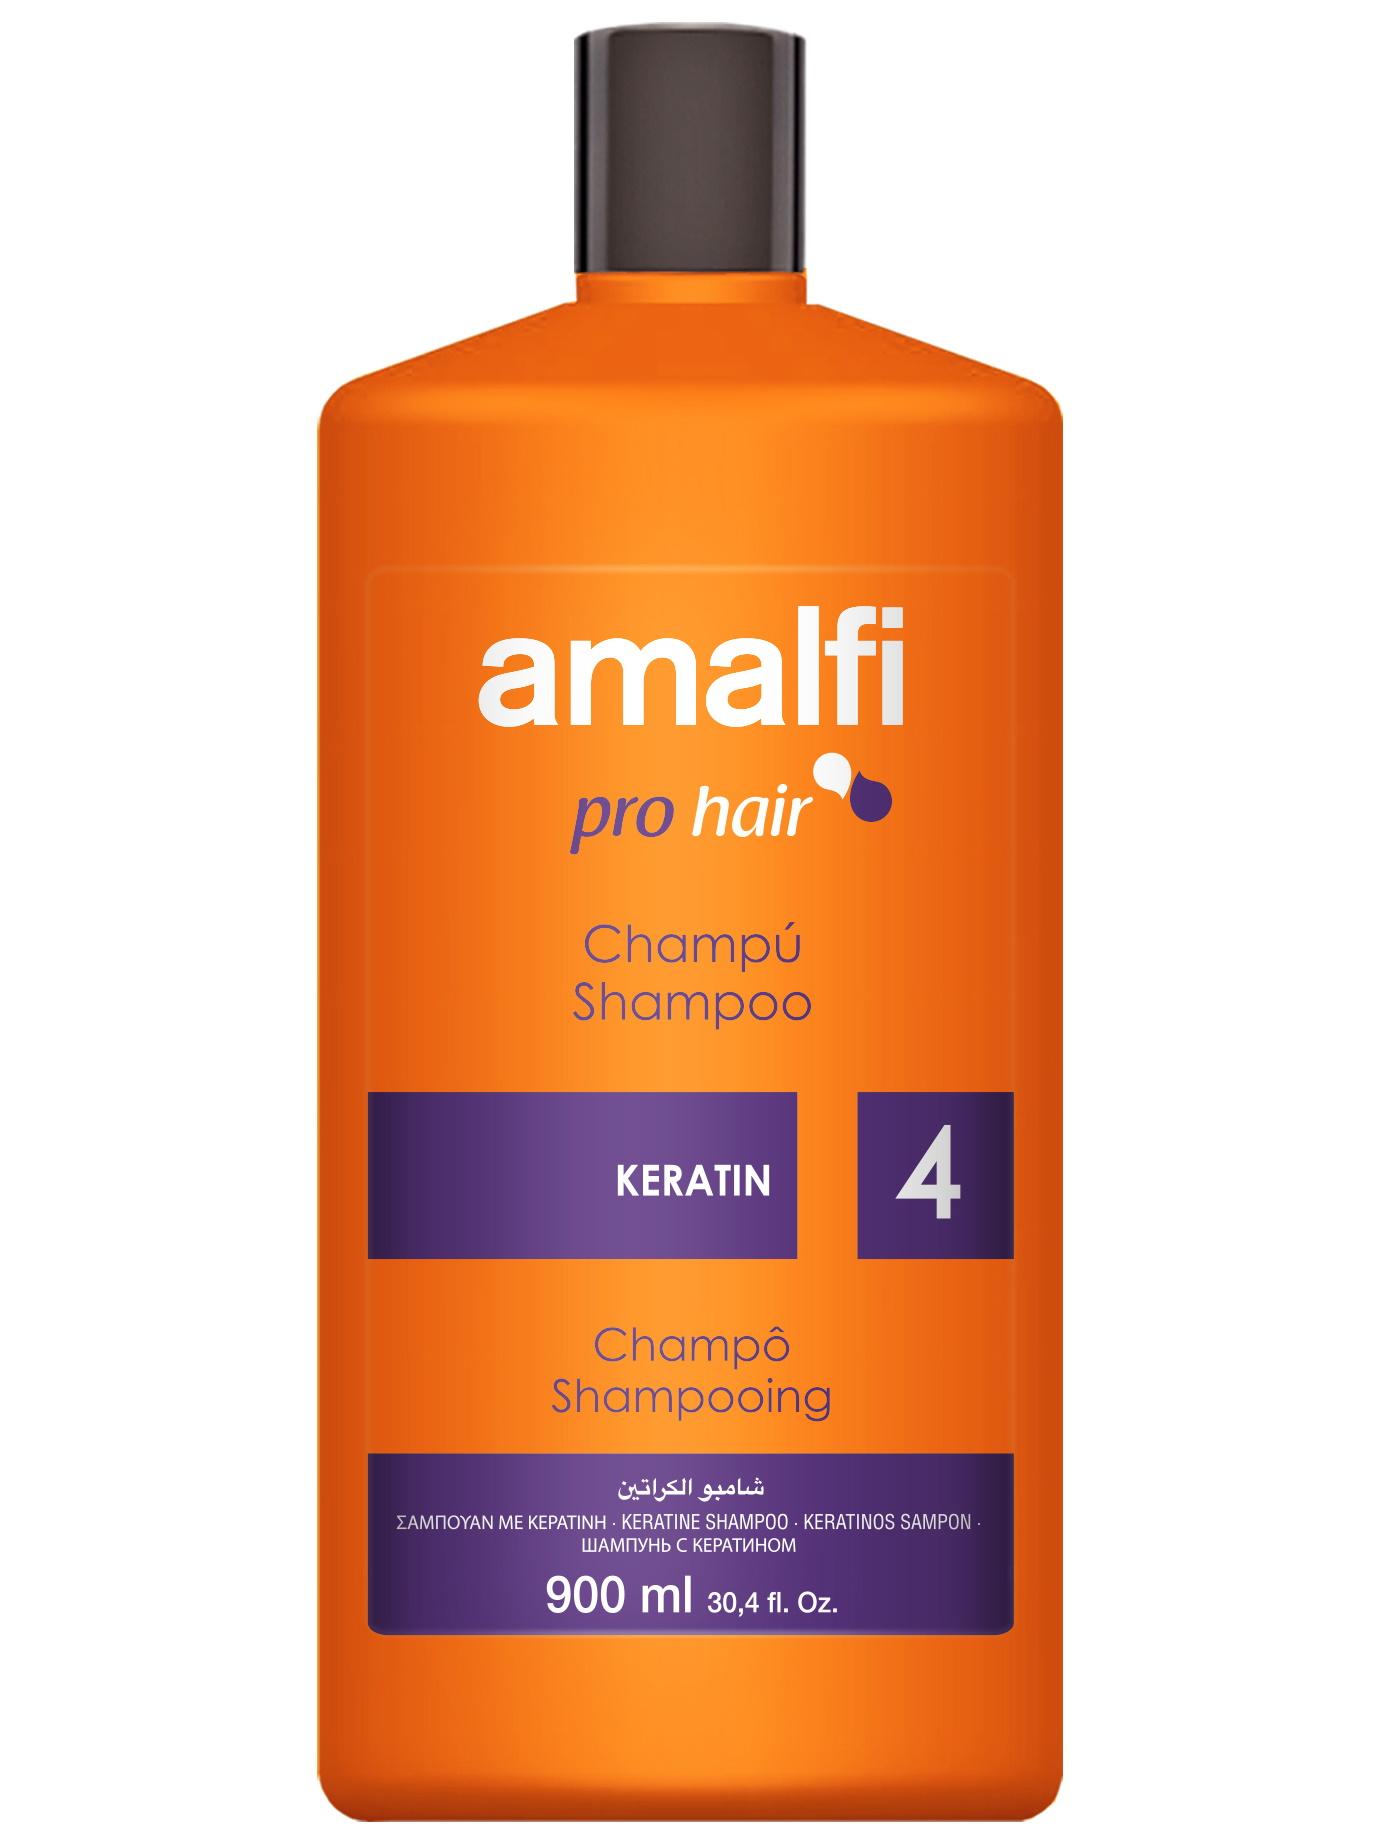 Купить Шампунь для ухода за волосами AMALFI keratin 900 мл, Amalfy